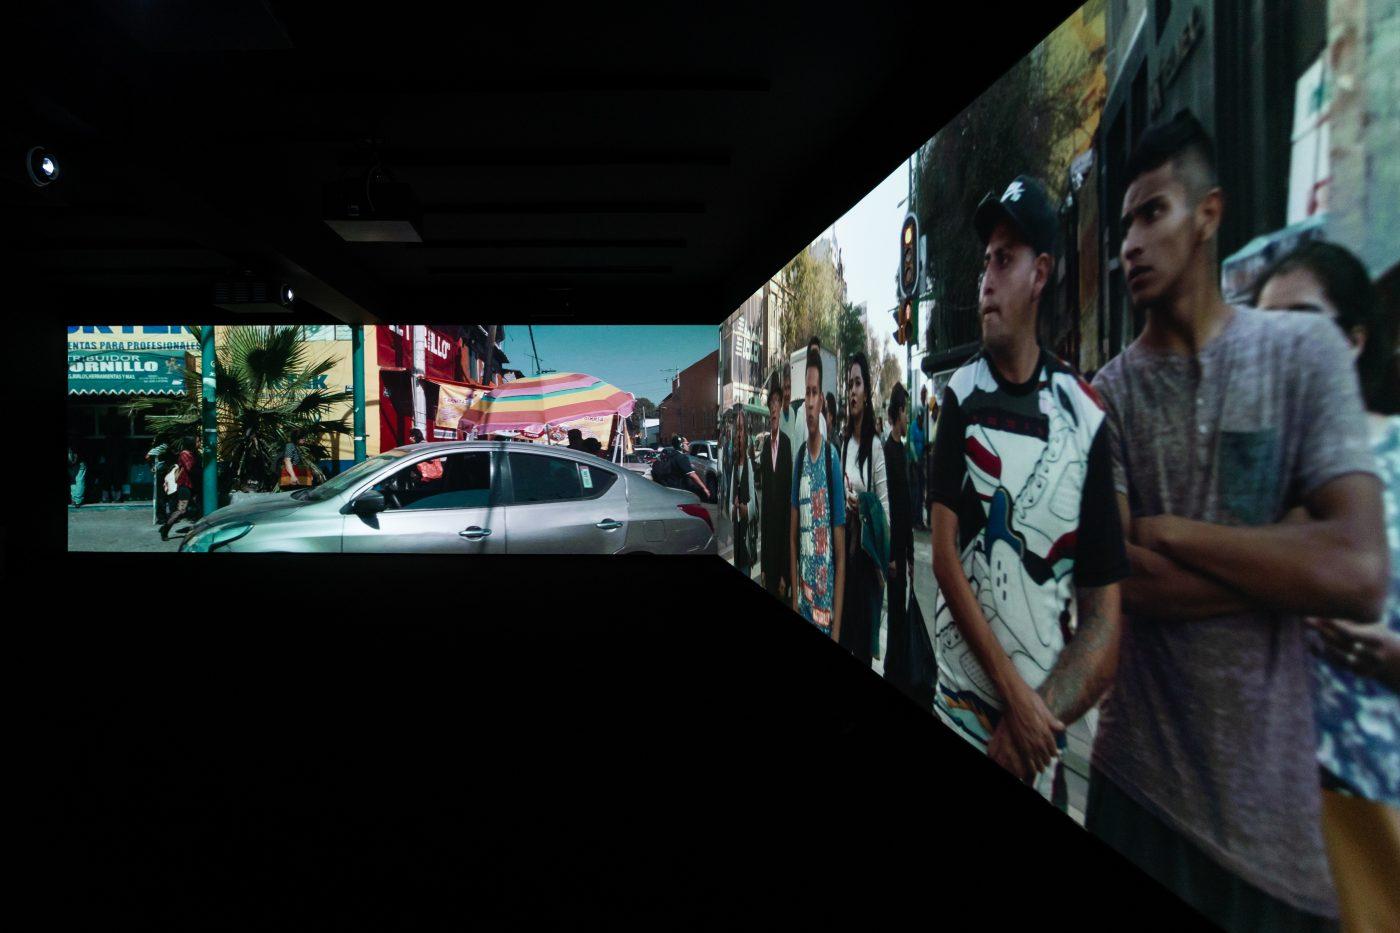 Exhibition view:Fenestra, Alexandre Farto aka Vhils, Galeria Vera Cortês, 2021